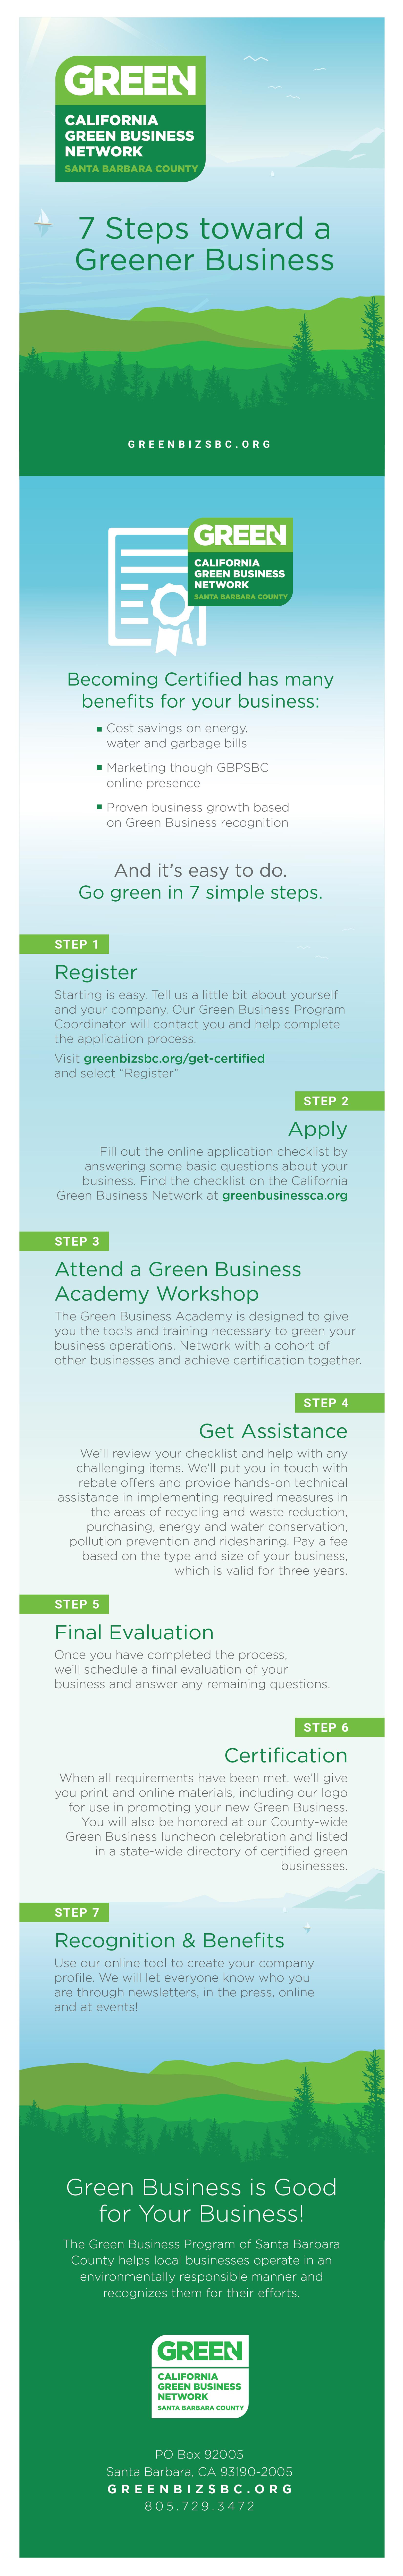 GreenBusiness_Brochure_DigitalVersion-01.jpg